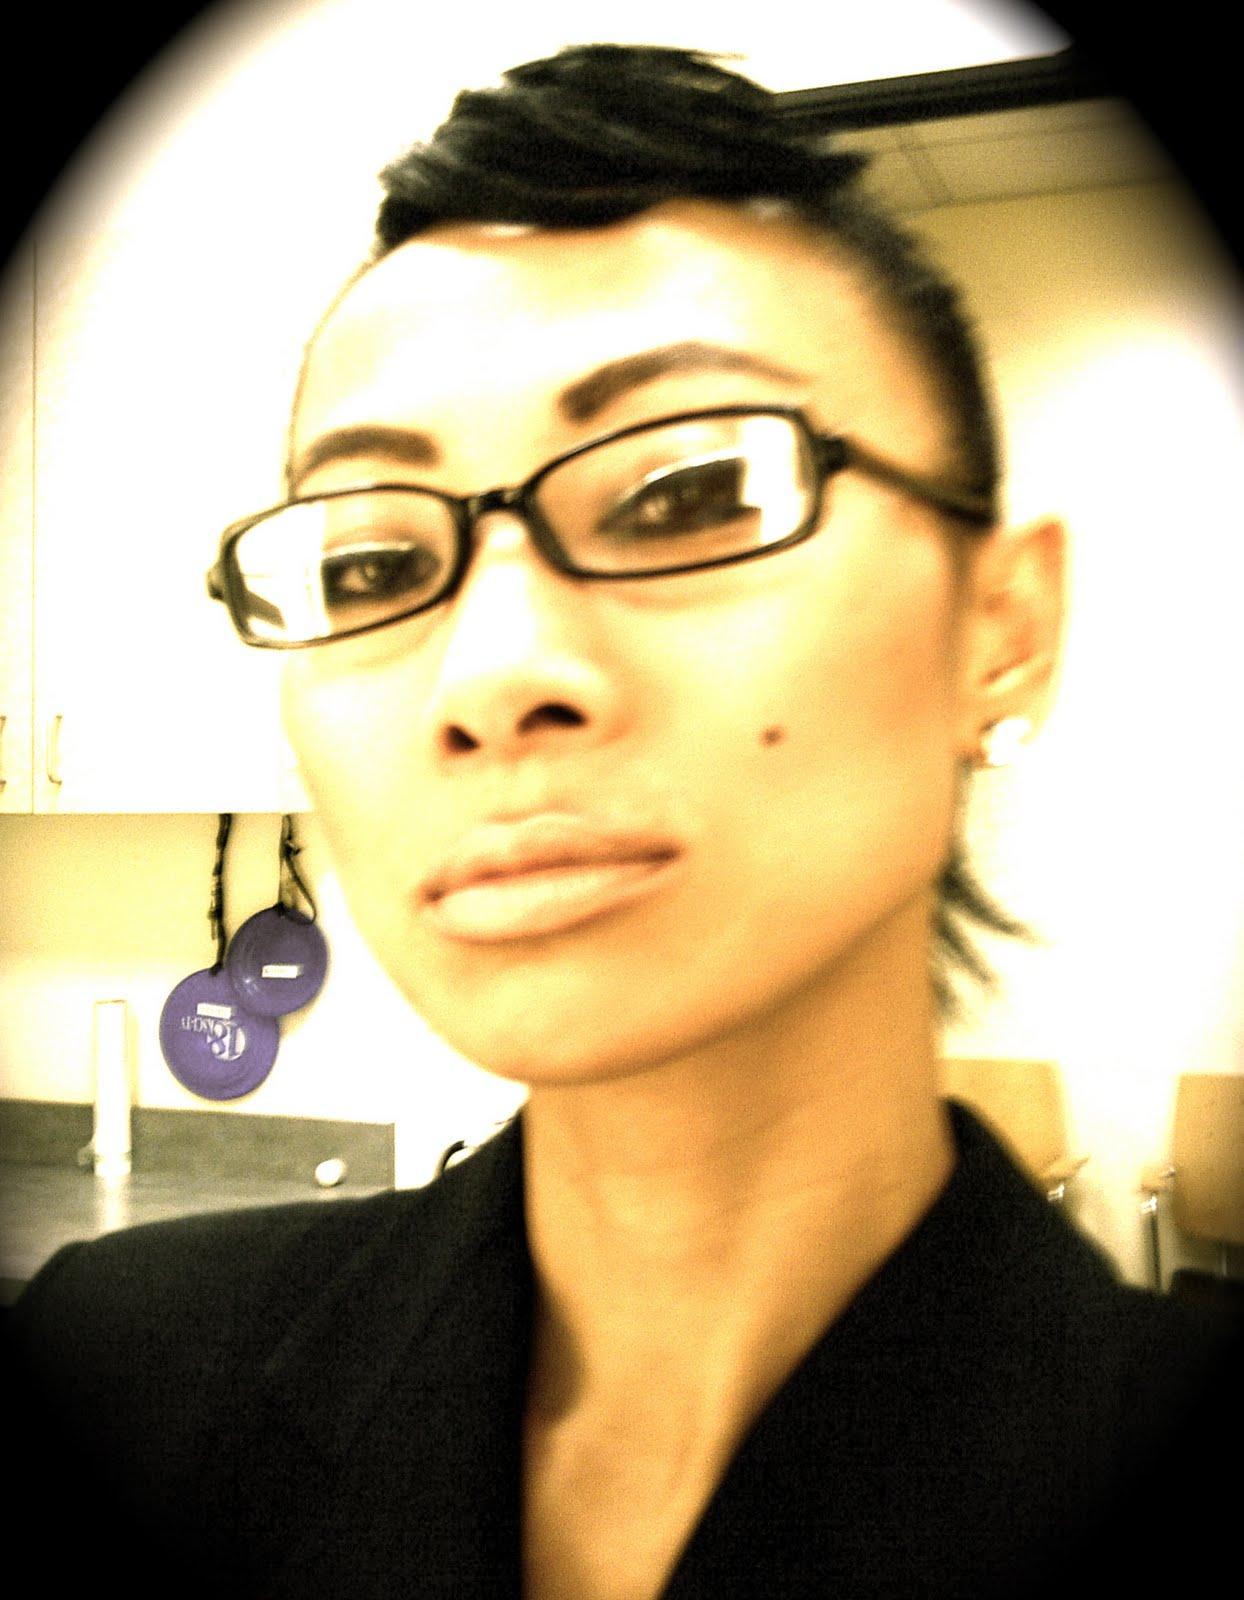 http://2.bp.blogspot.com/-bzA7z66256Q/TmNugyNjXaI/AAAAAAAAM44/E5K05PH09kk/s1600/IMG-20110902-07399.jpg